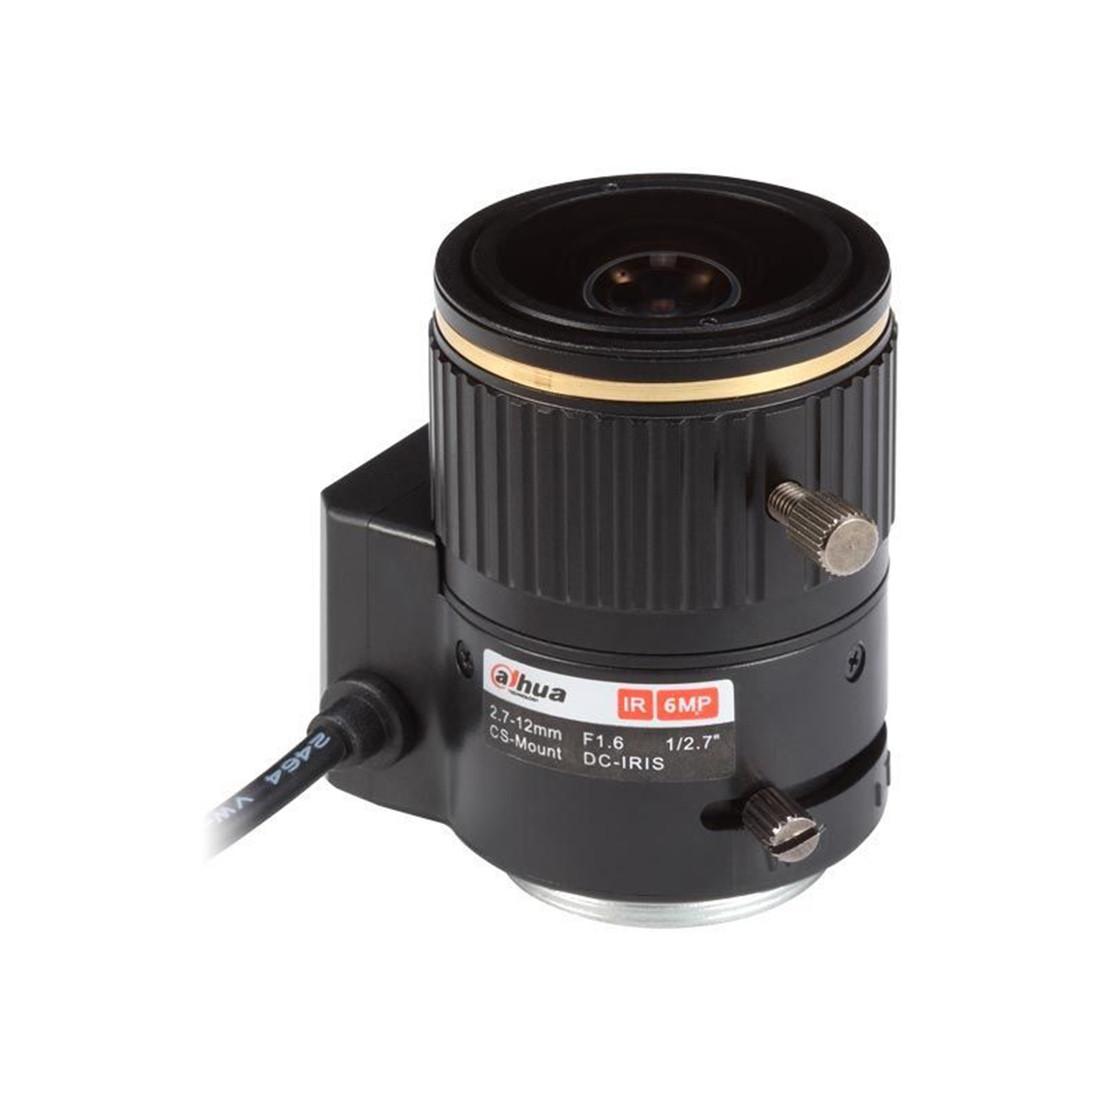 "Dahua DH-PFL2712-E6D Объектив для камер видеонаблюдения 1/2.7"", 6 мегапикс., Фокусное расстояние: f=2.7-12 мм."